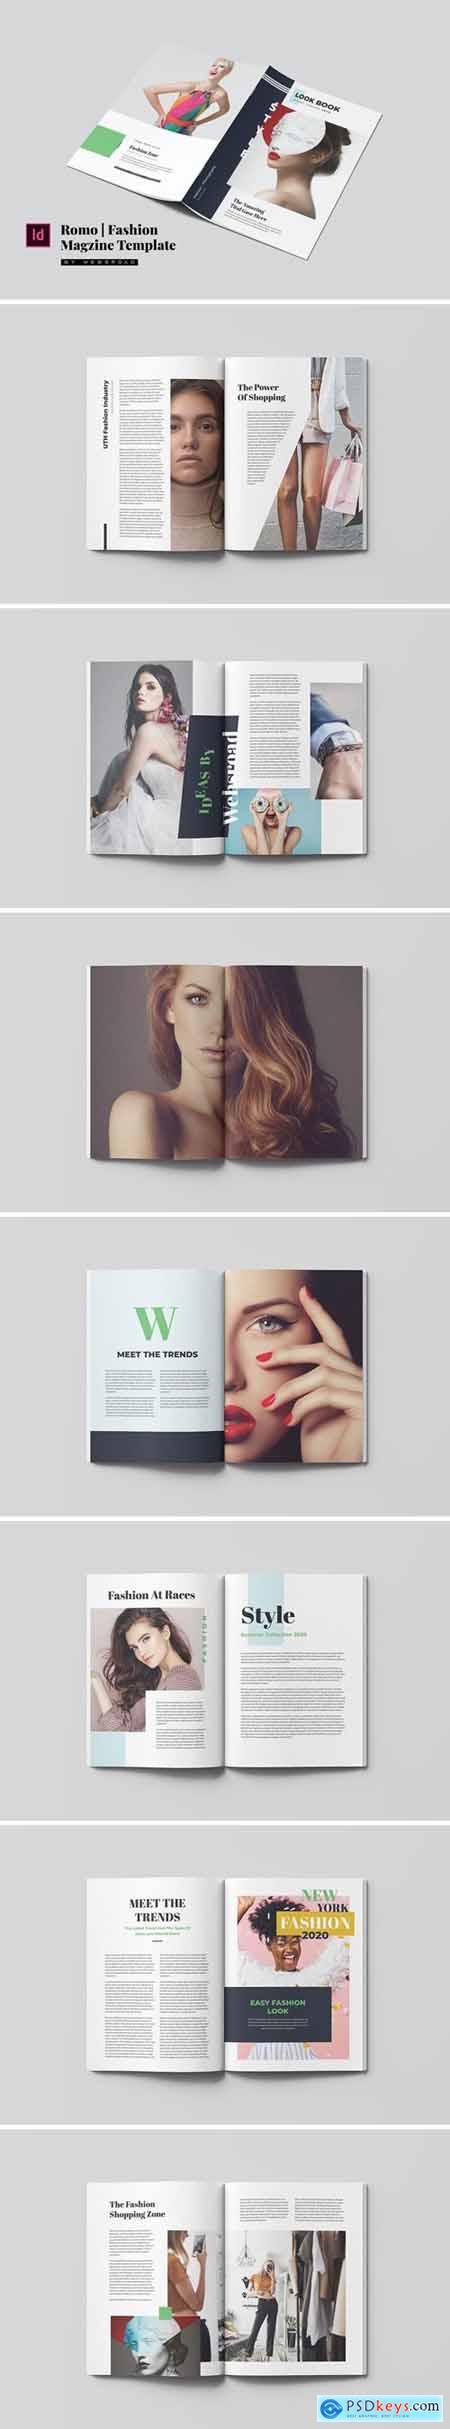 Romo - Fashion Magazine Template